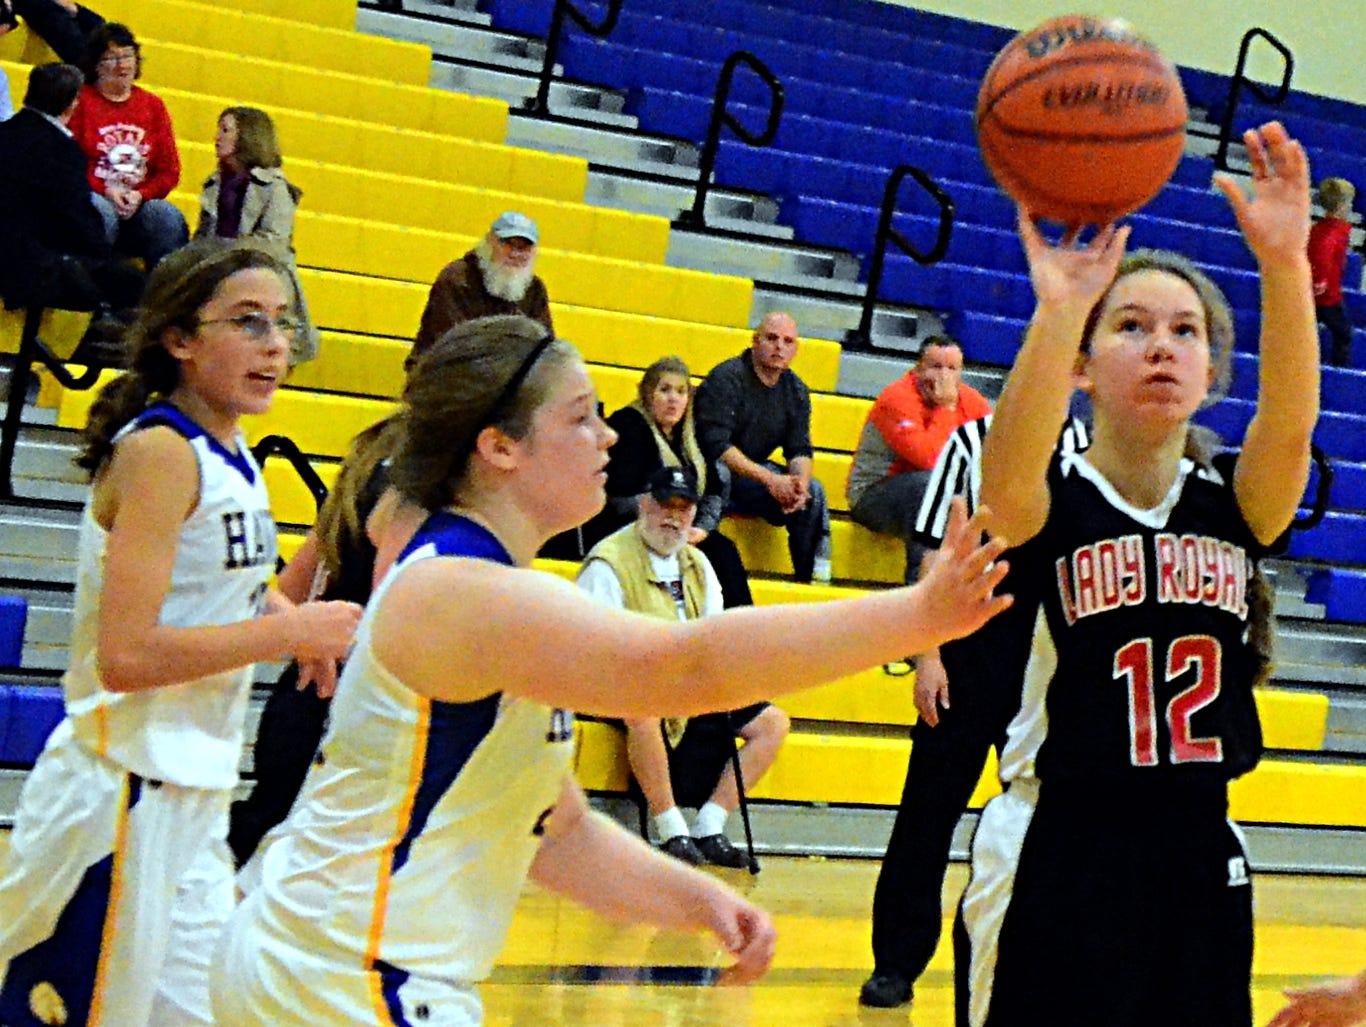 Aaron Academy freshman Dailyn Hannah elevates to shoot under pressure from Merrol Hyde Magnet sophomore Lauren Buchanen during third-quarter action.